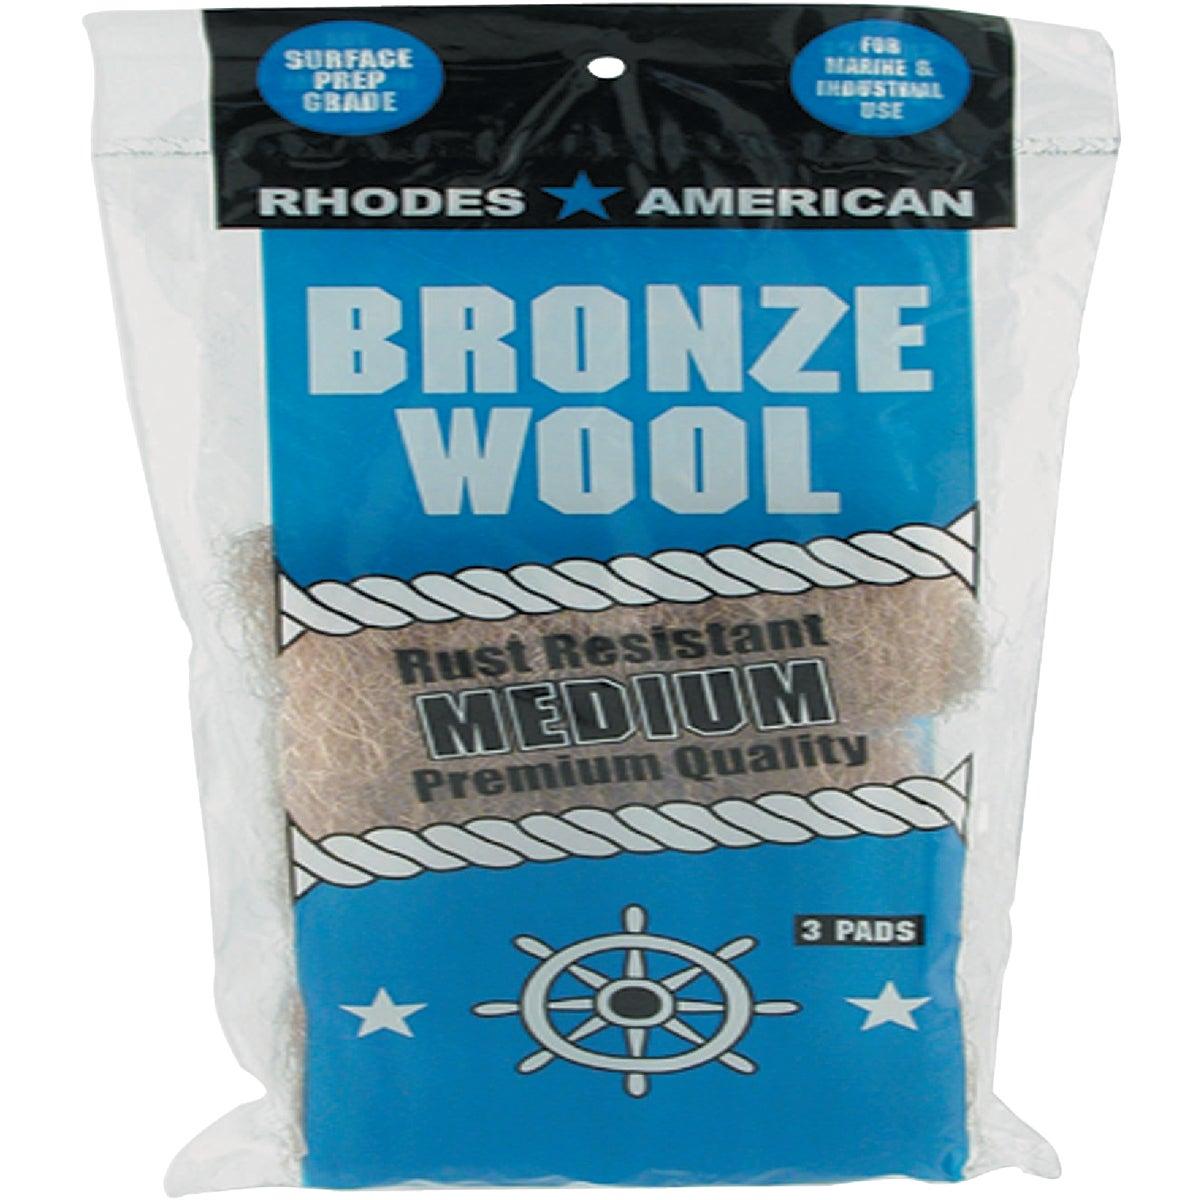 3PK MEDIUM BRONZE WOOL - 123101 by Homax Group Inc